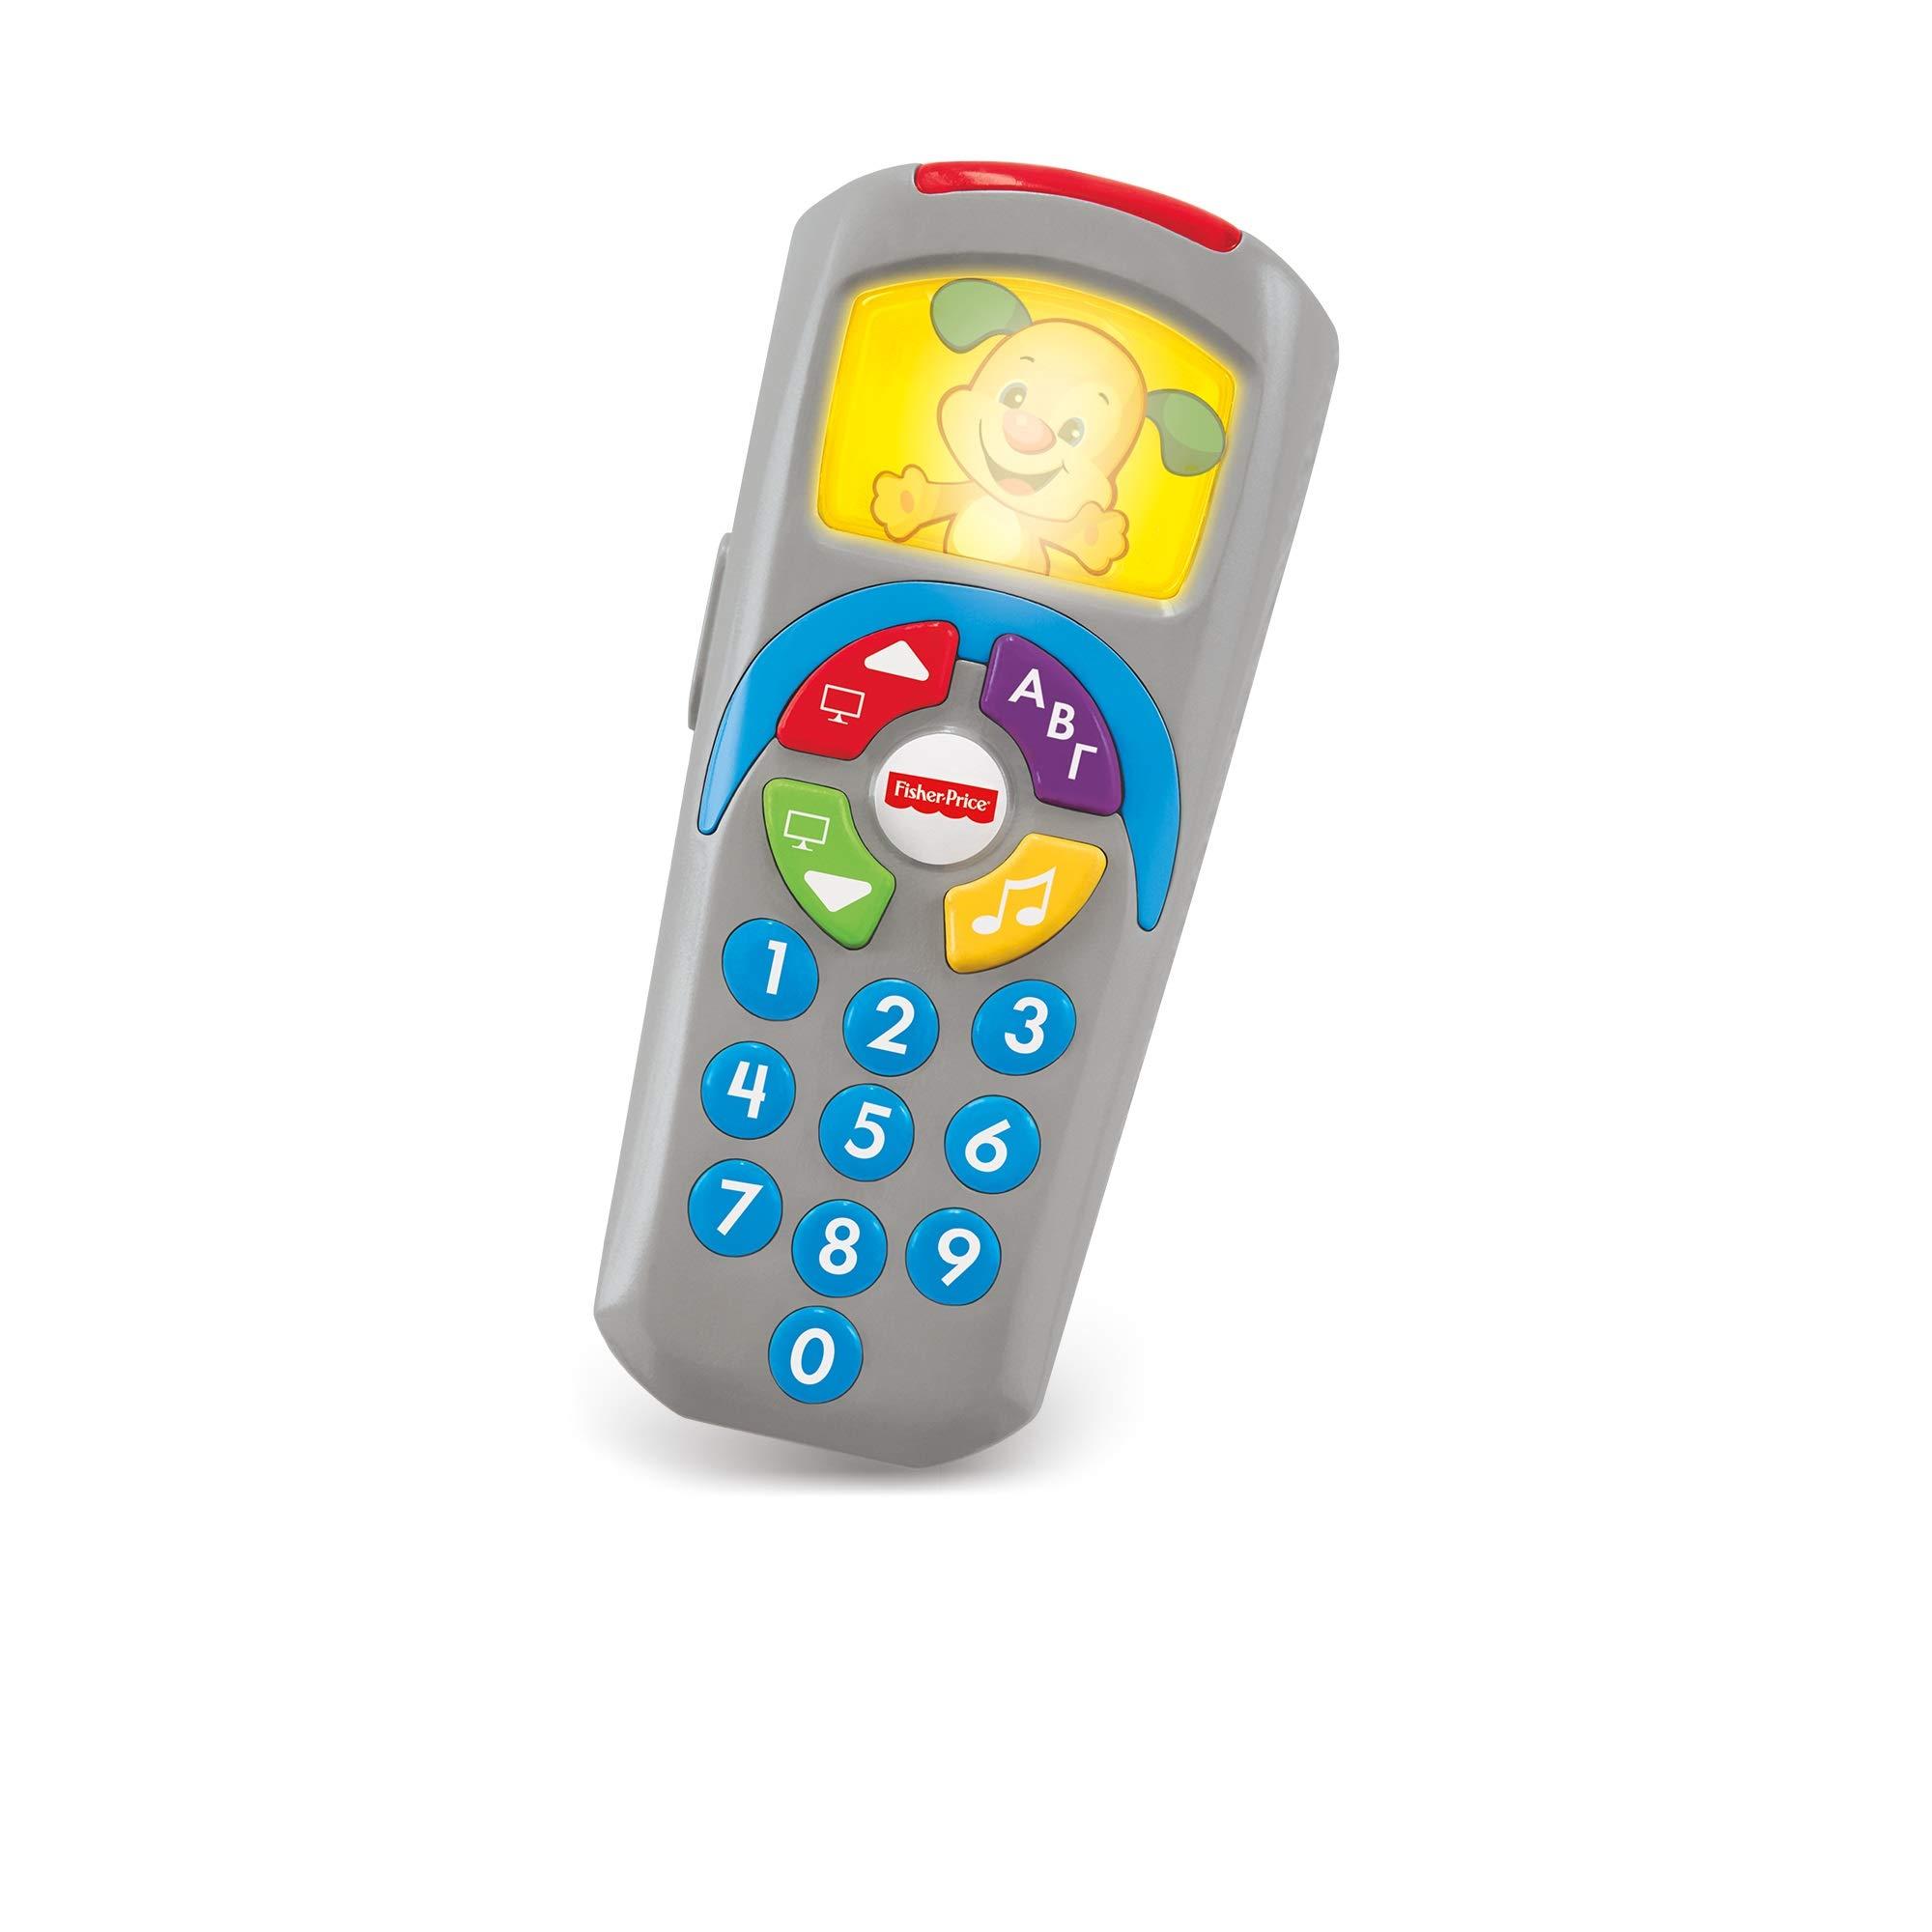 Fisher-Price Mando a distancia perrito, juguete electrónico bebé +6 meses (Mattel